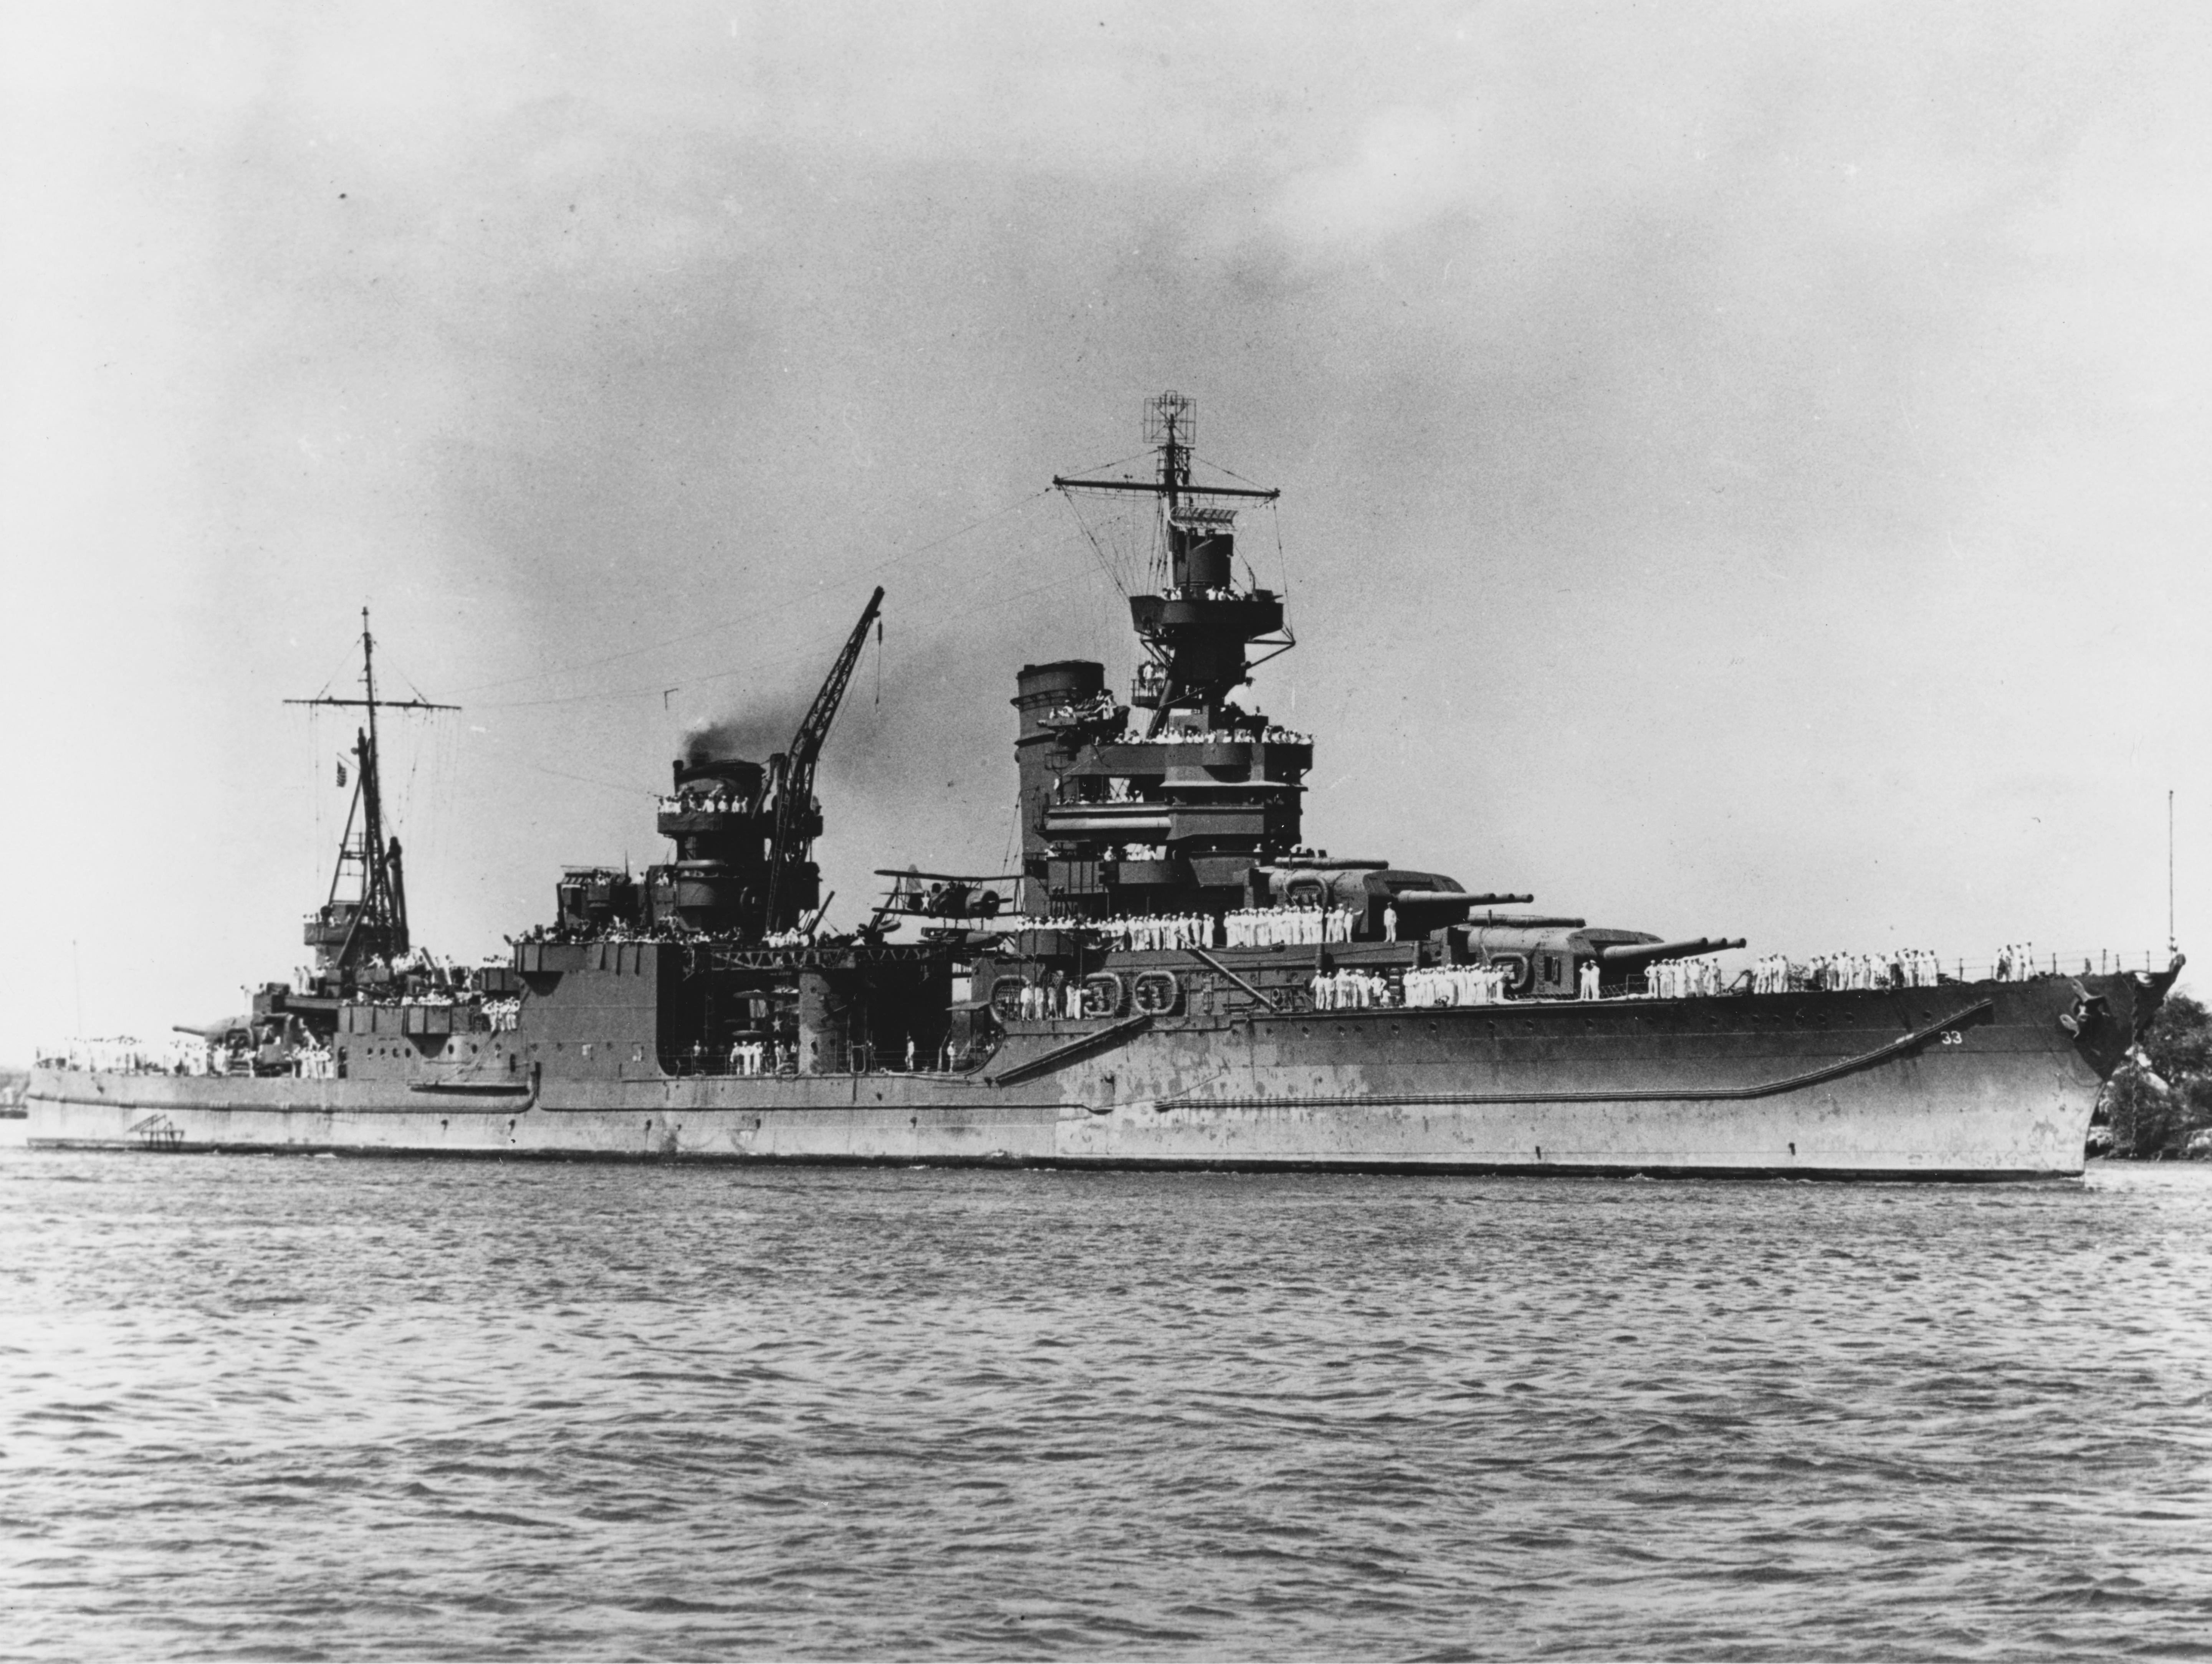 http://upload.wikimedia.org/wikipedia/commons/c/ca/USS_Portland_%28CA-33%29_at_Pearl_Harbor_1942.jpg